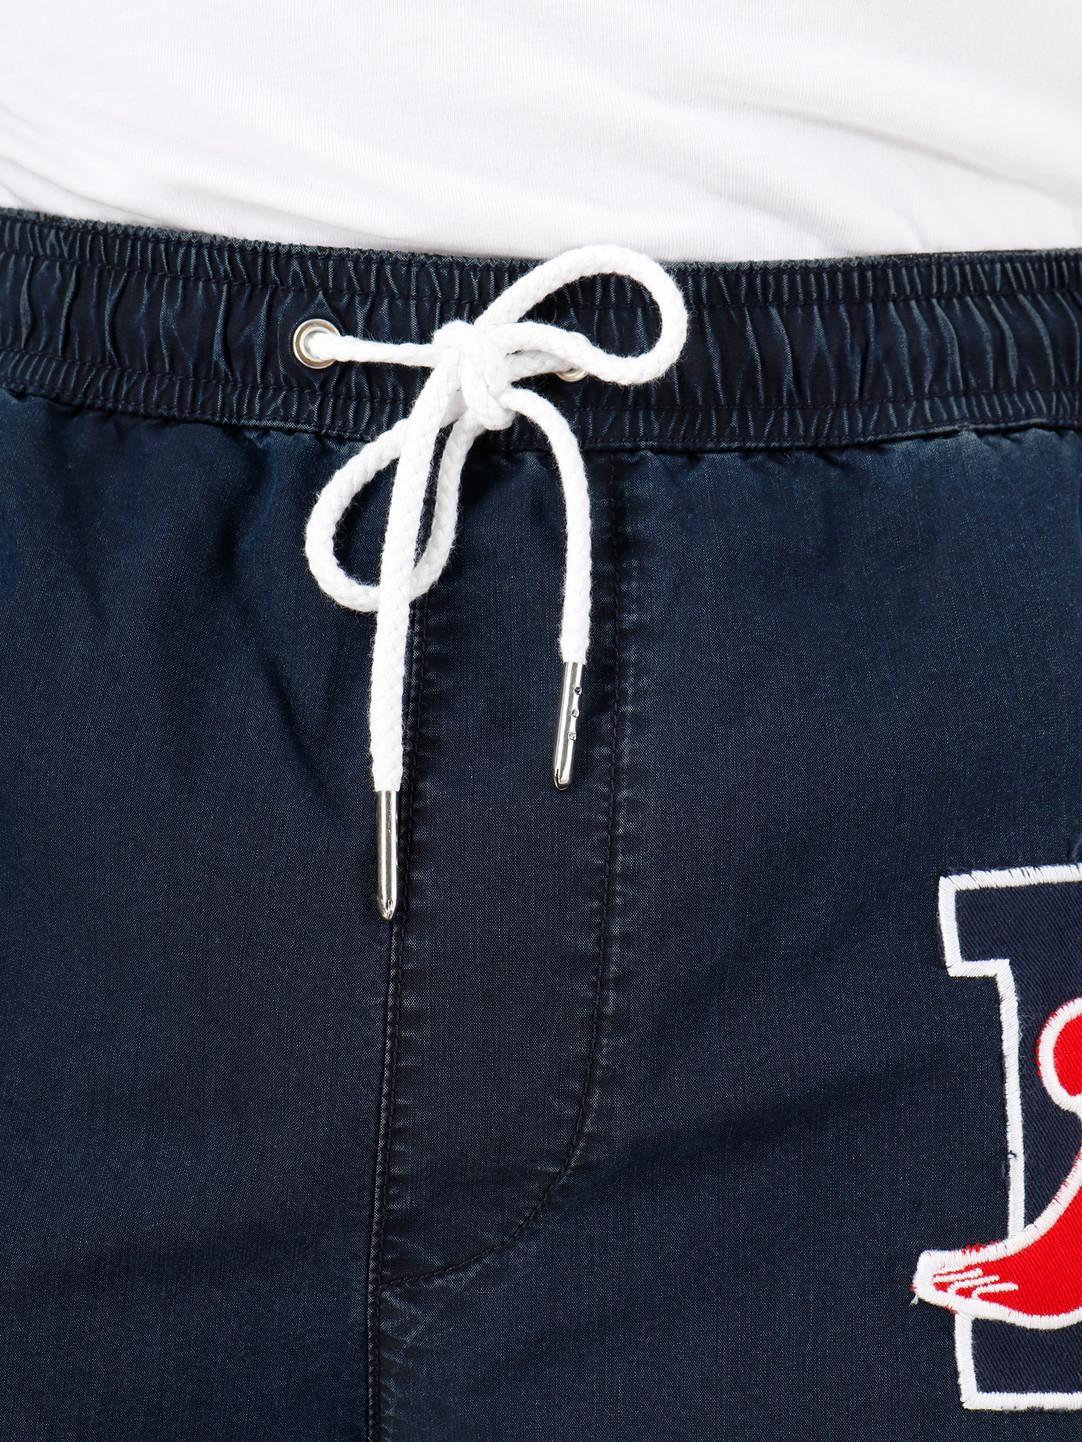 Polo Ralph Lauren Polo Ralph Lauren Tear Away P Athletic Pant Ridge Wash 710752864001